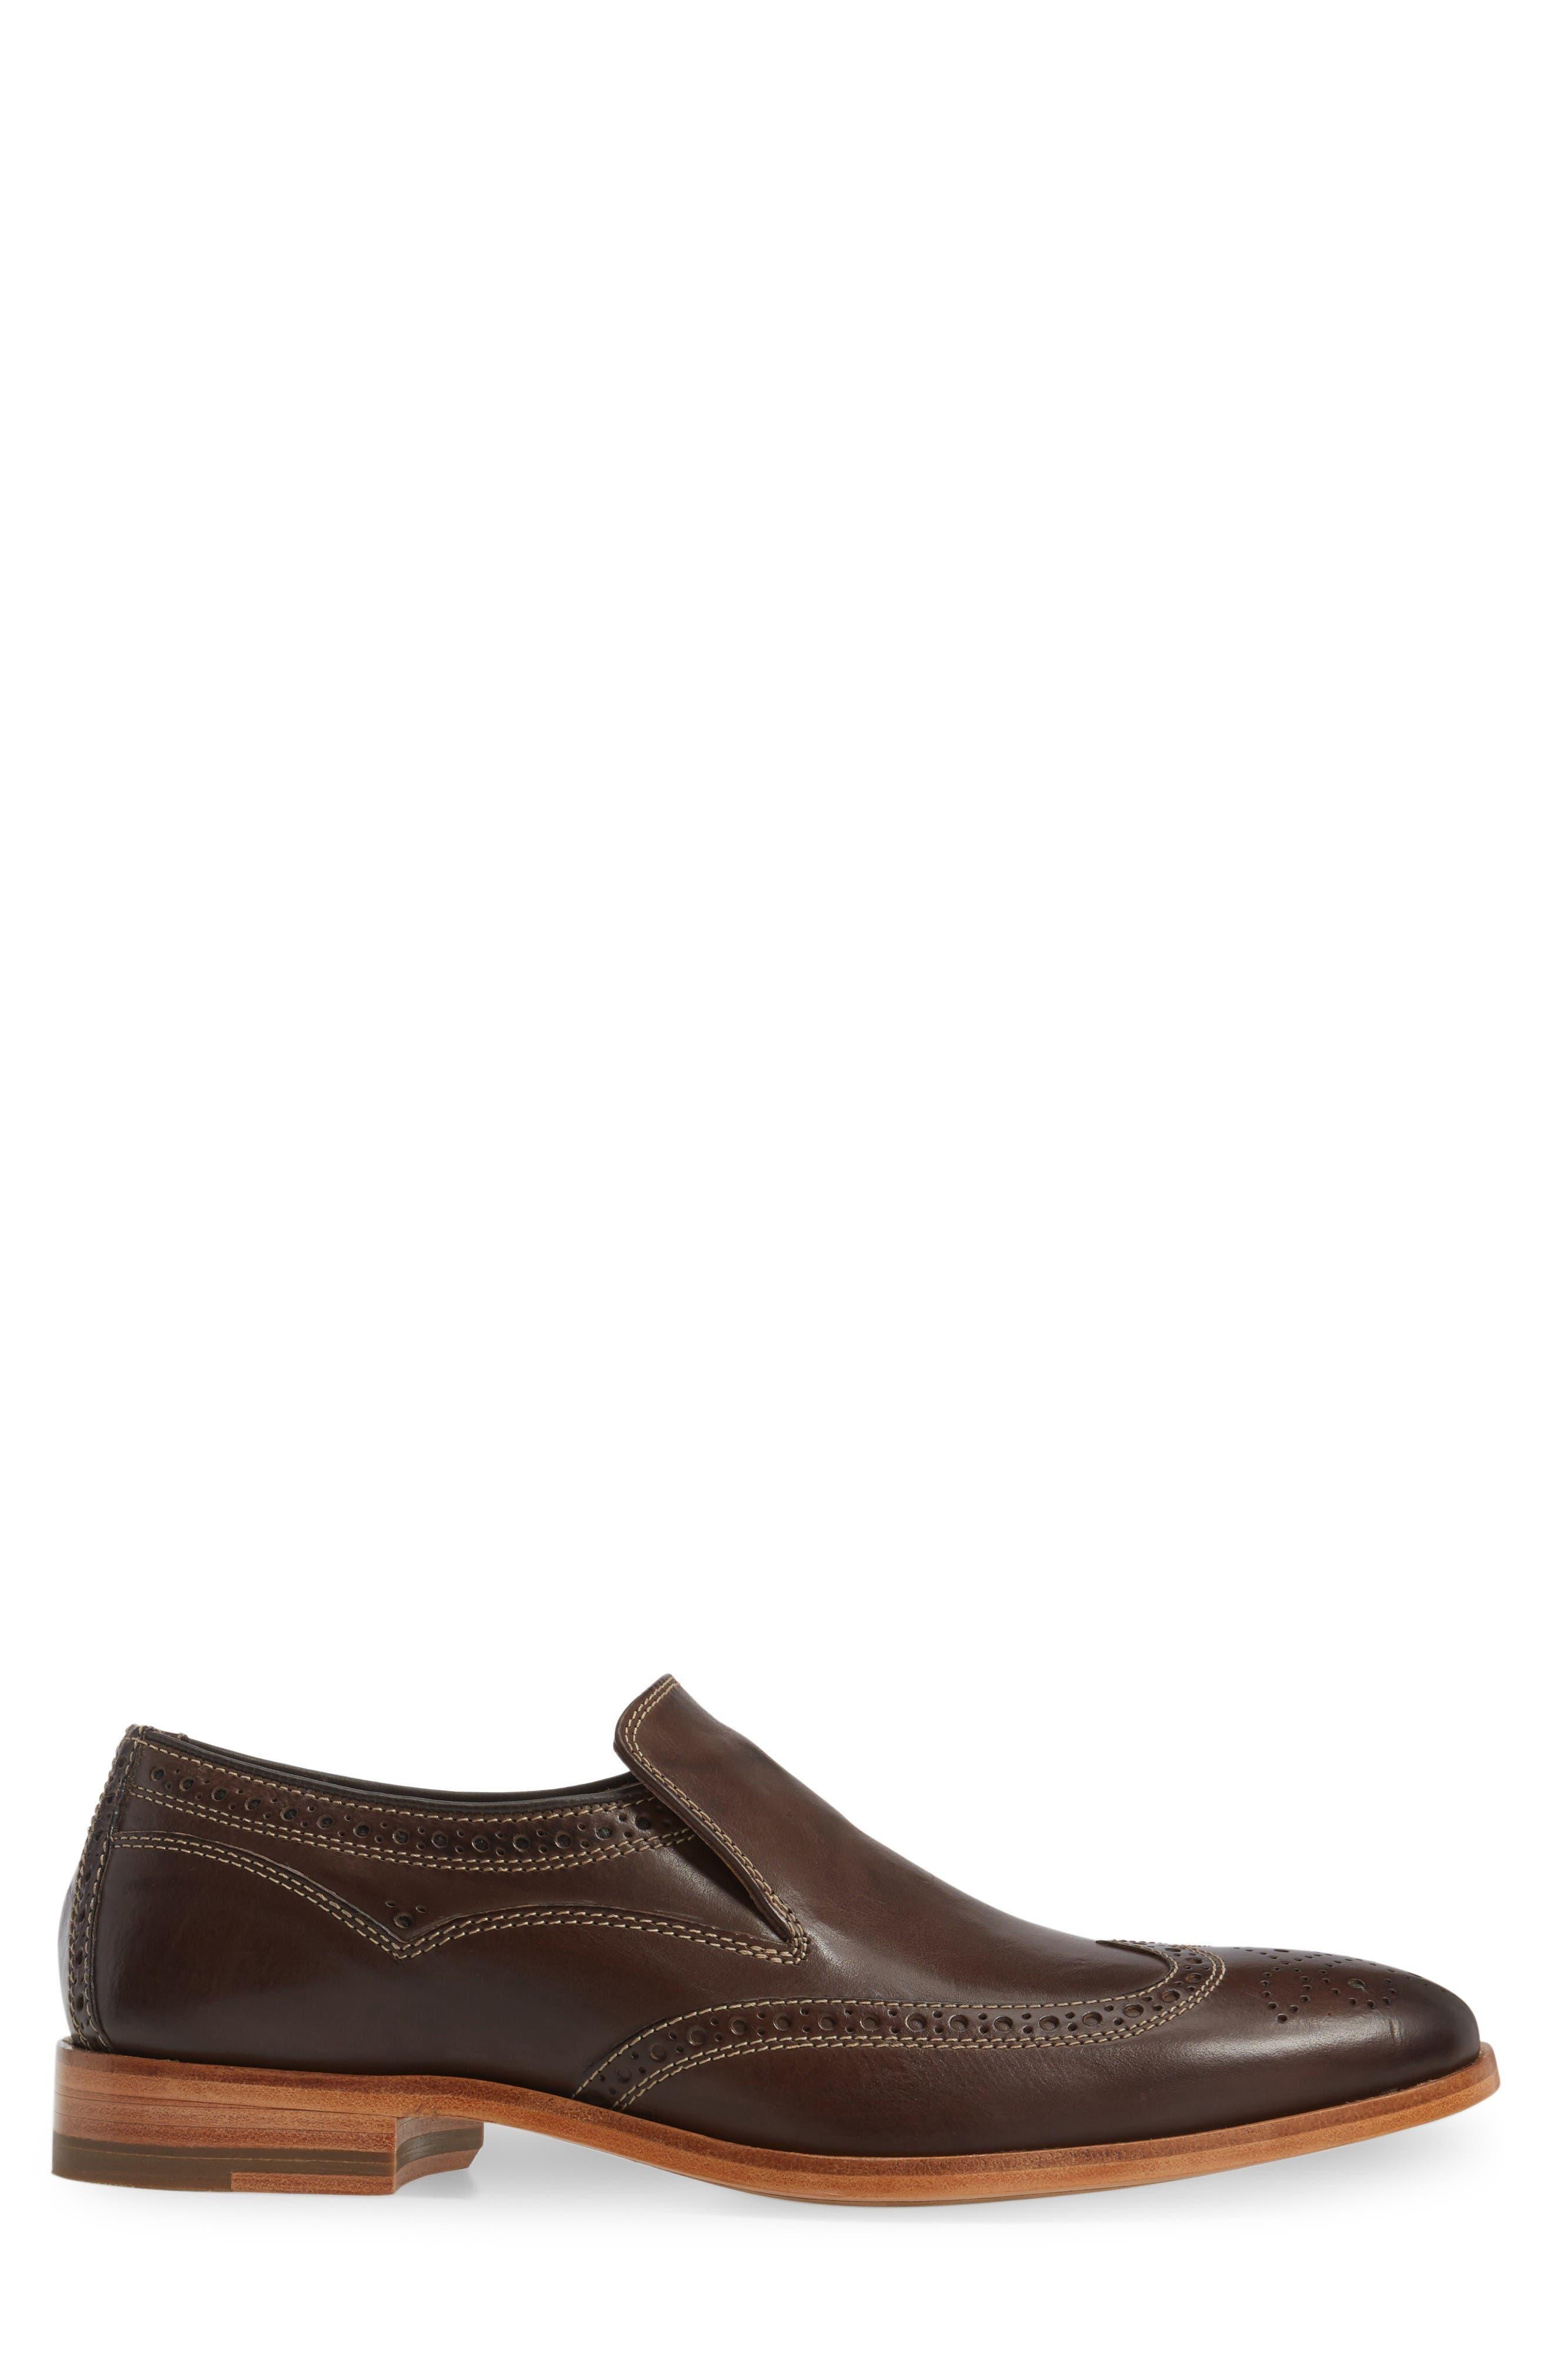 Graham Wingtip Loafer,                             Alternate thumbnail 3, color,                             Dark Brown Calfskin Leather